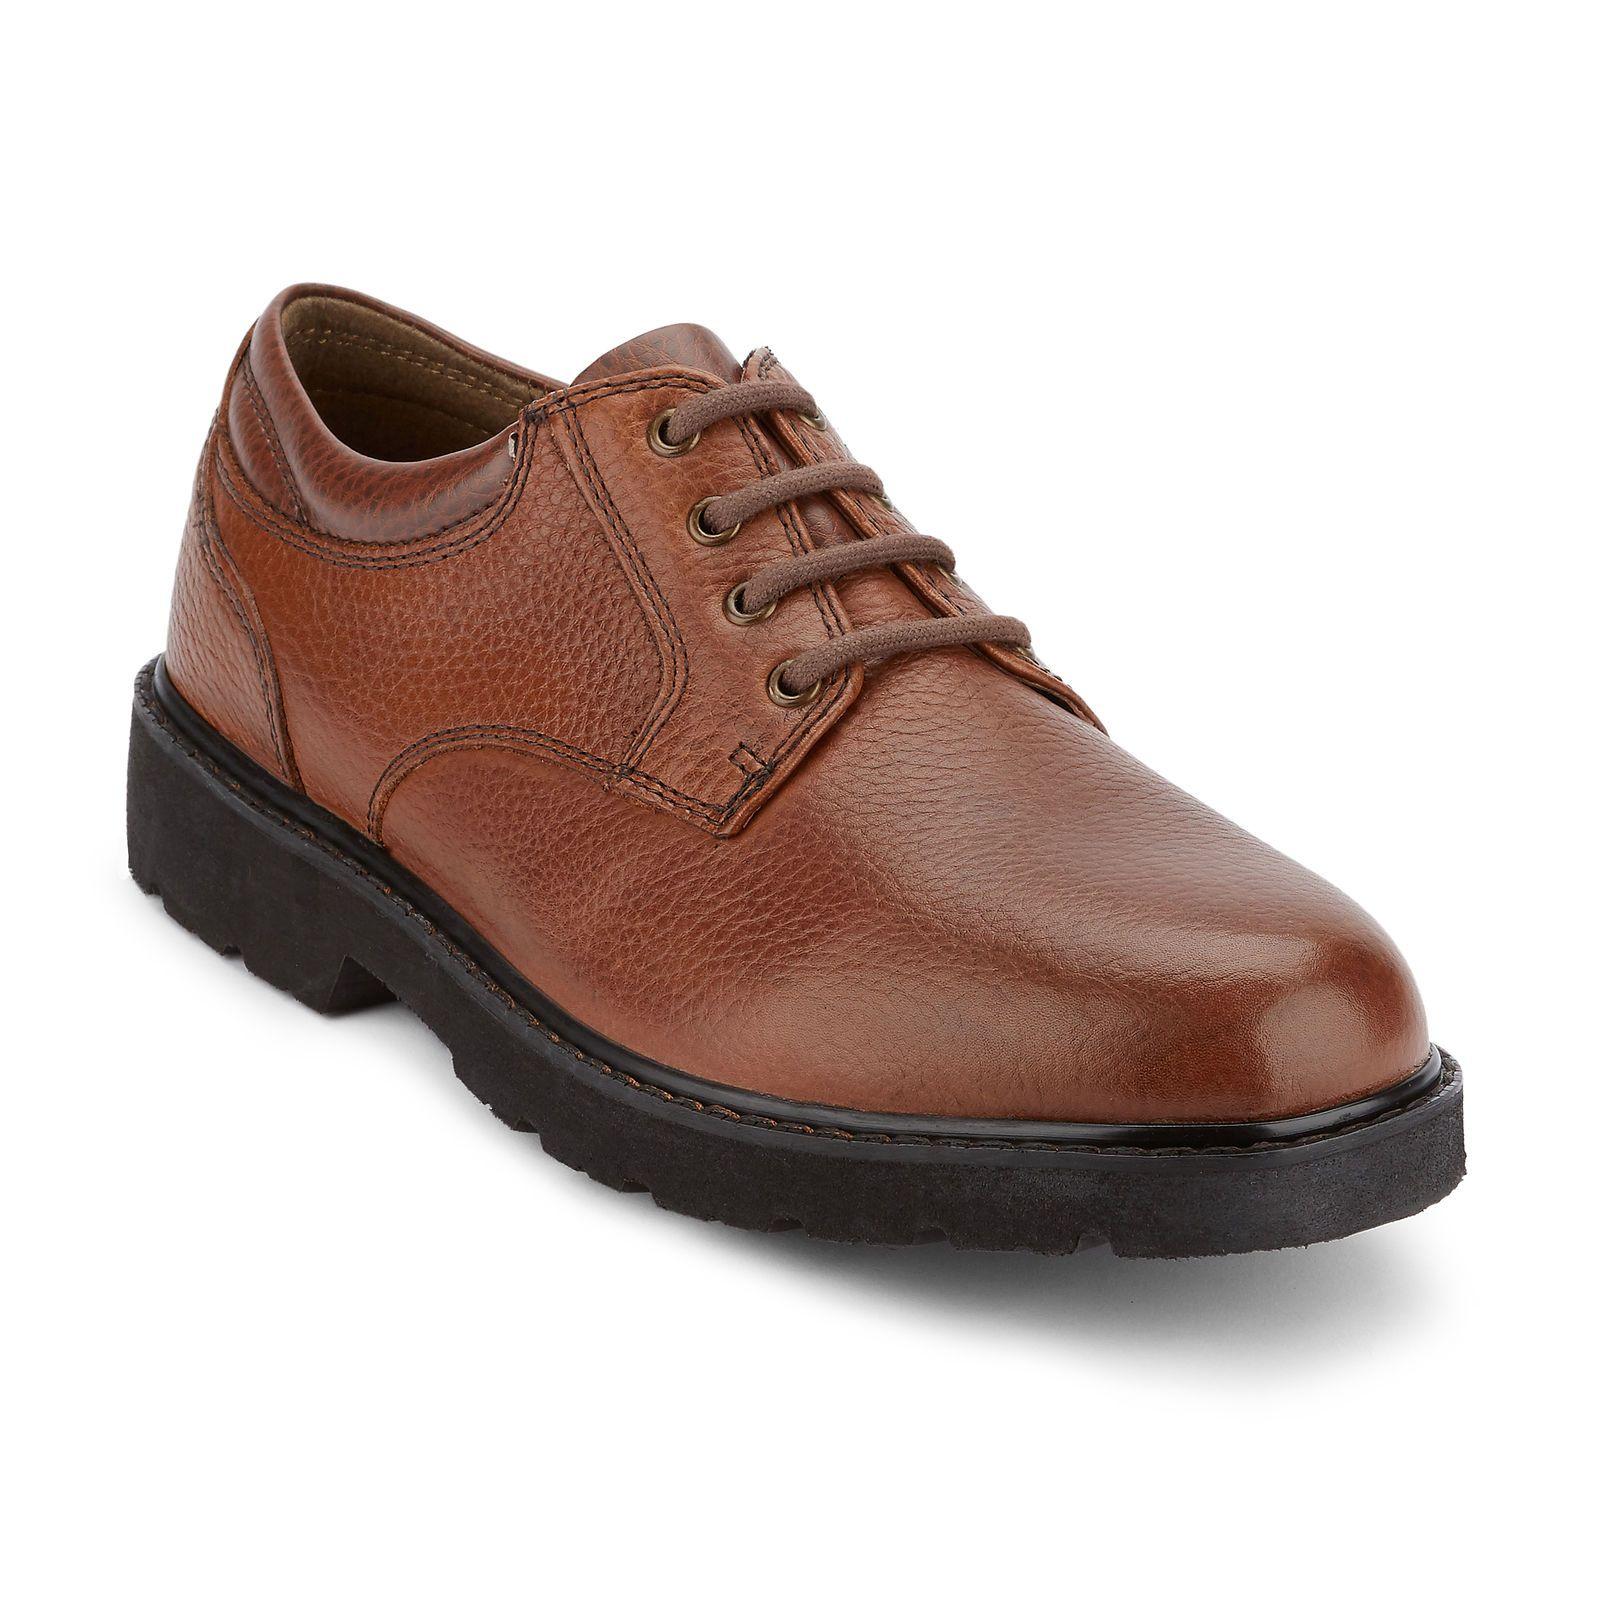 Mens Dockers Men's Shelter Plain Toe Oxford Outlet Genuine Size 45